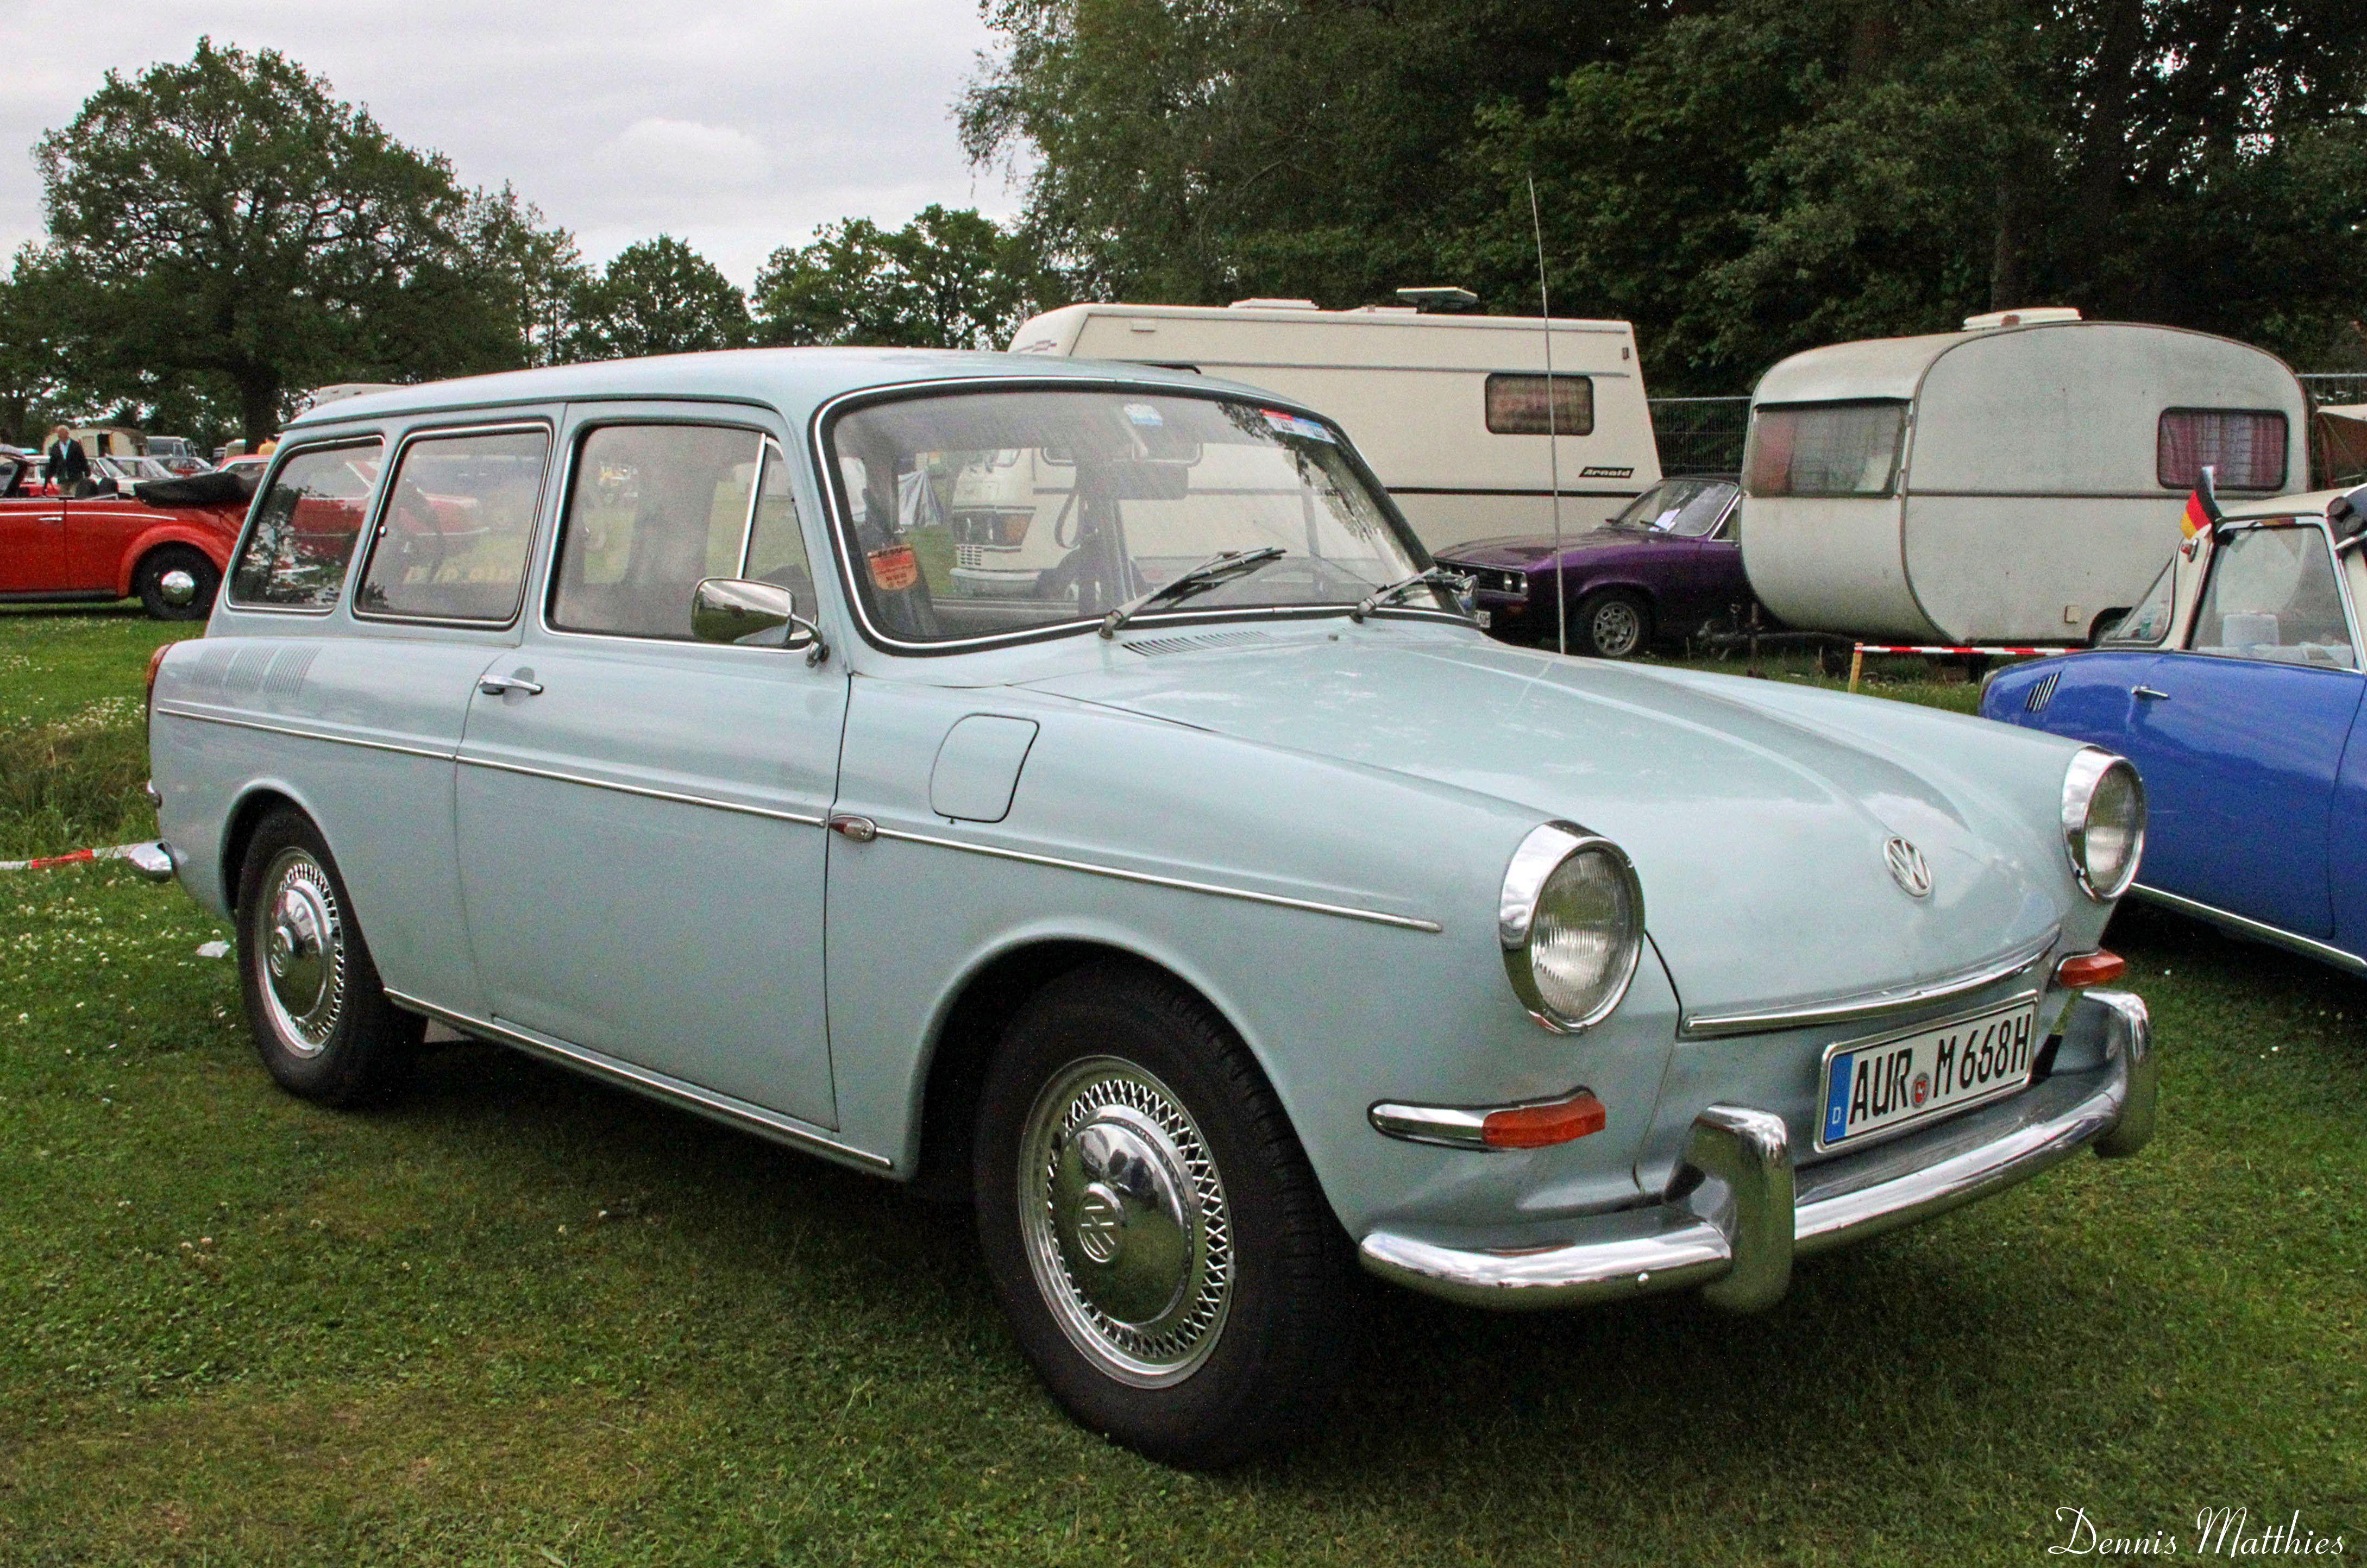 volkswagen variant 1600 l photos news reviews specs car listings. Black Bedroom Furniture Sets. Home Design Ideas